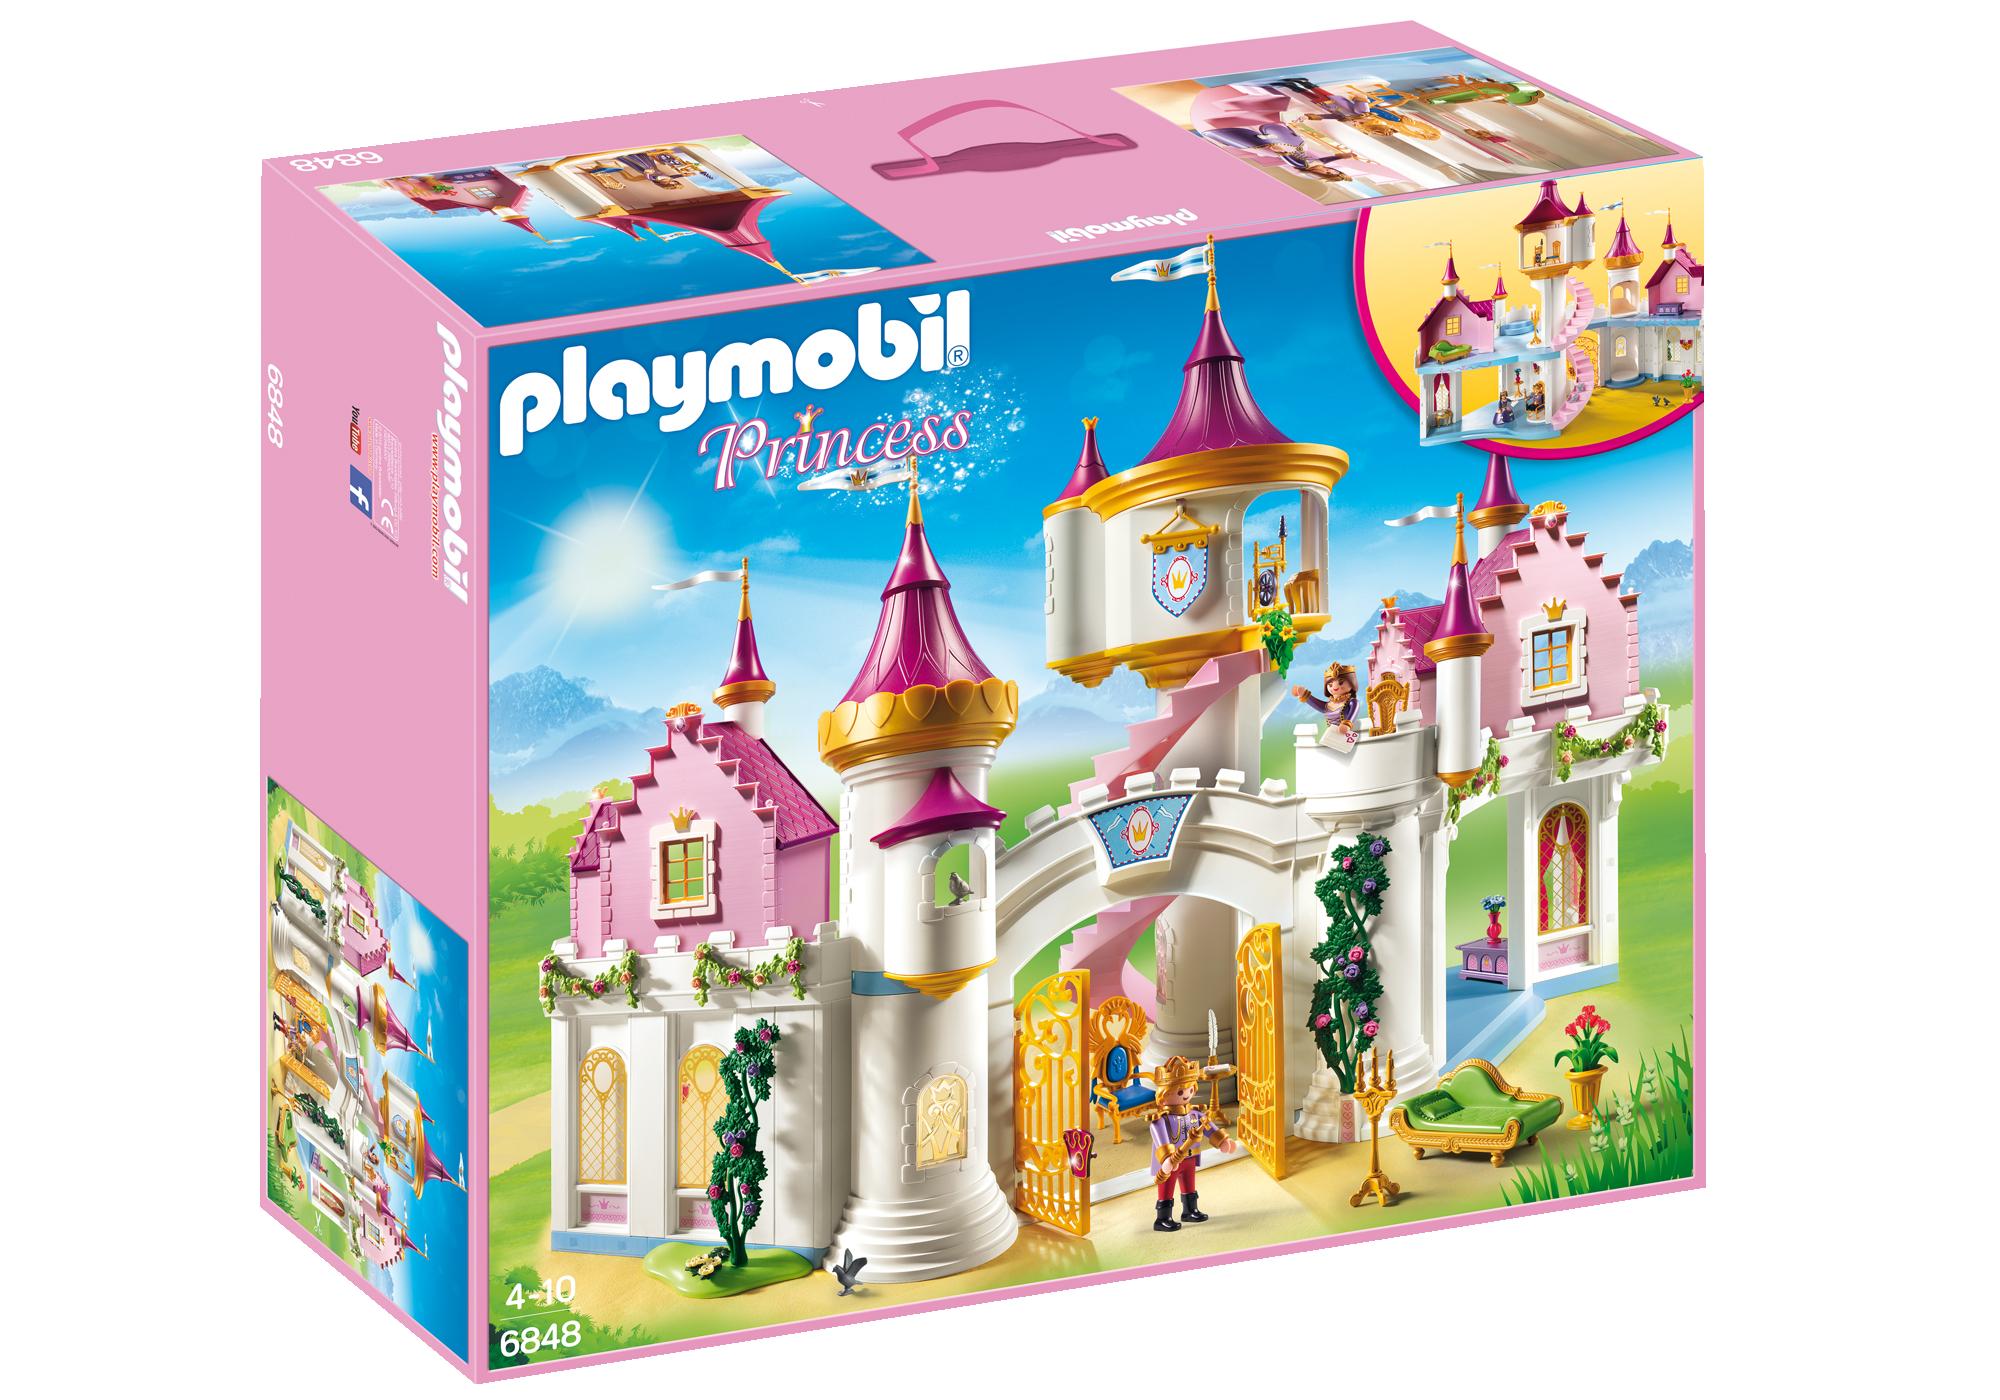 http://media.playmobil.com/i/playmobil/6848_product_box_front/Замок Принцессы: Большой Замок Принцессы